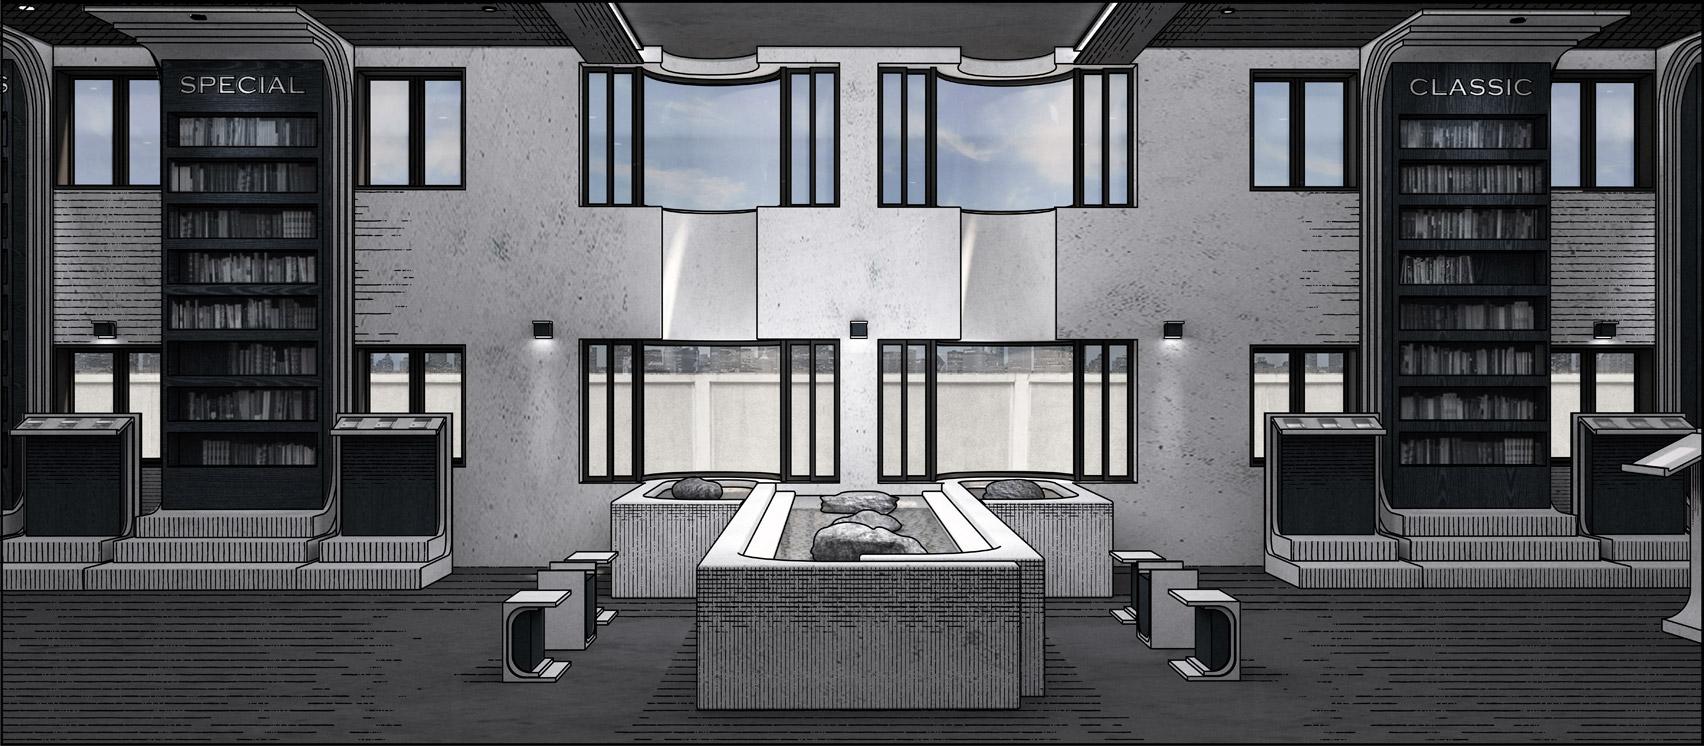 A visual of Archive Moleskine: Moleskine Space Branding by Haim Jung from Hongik University